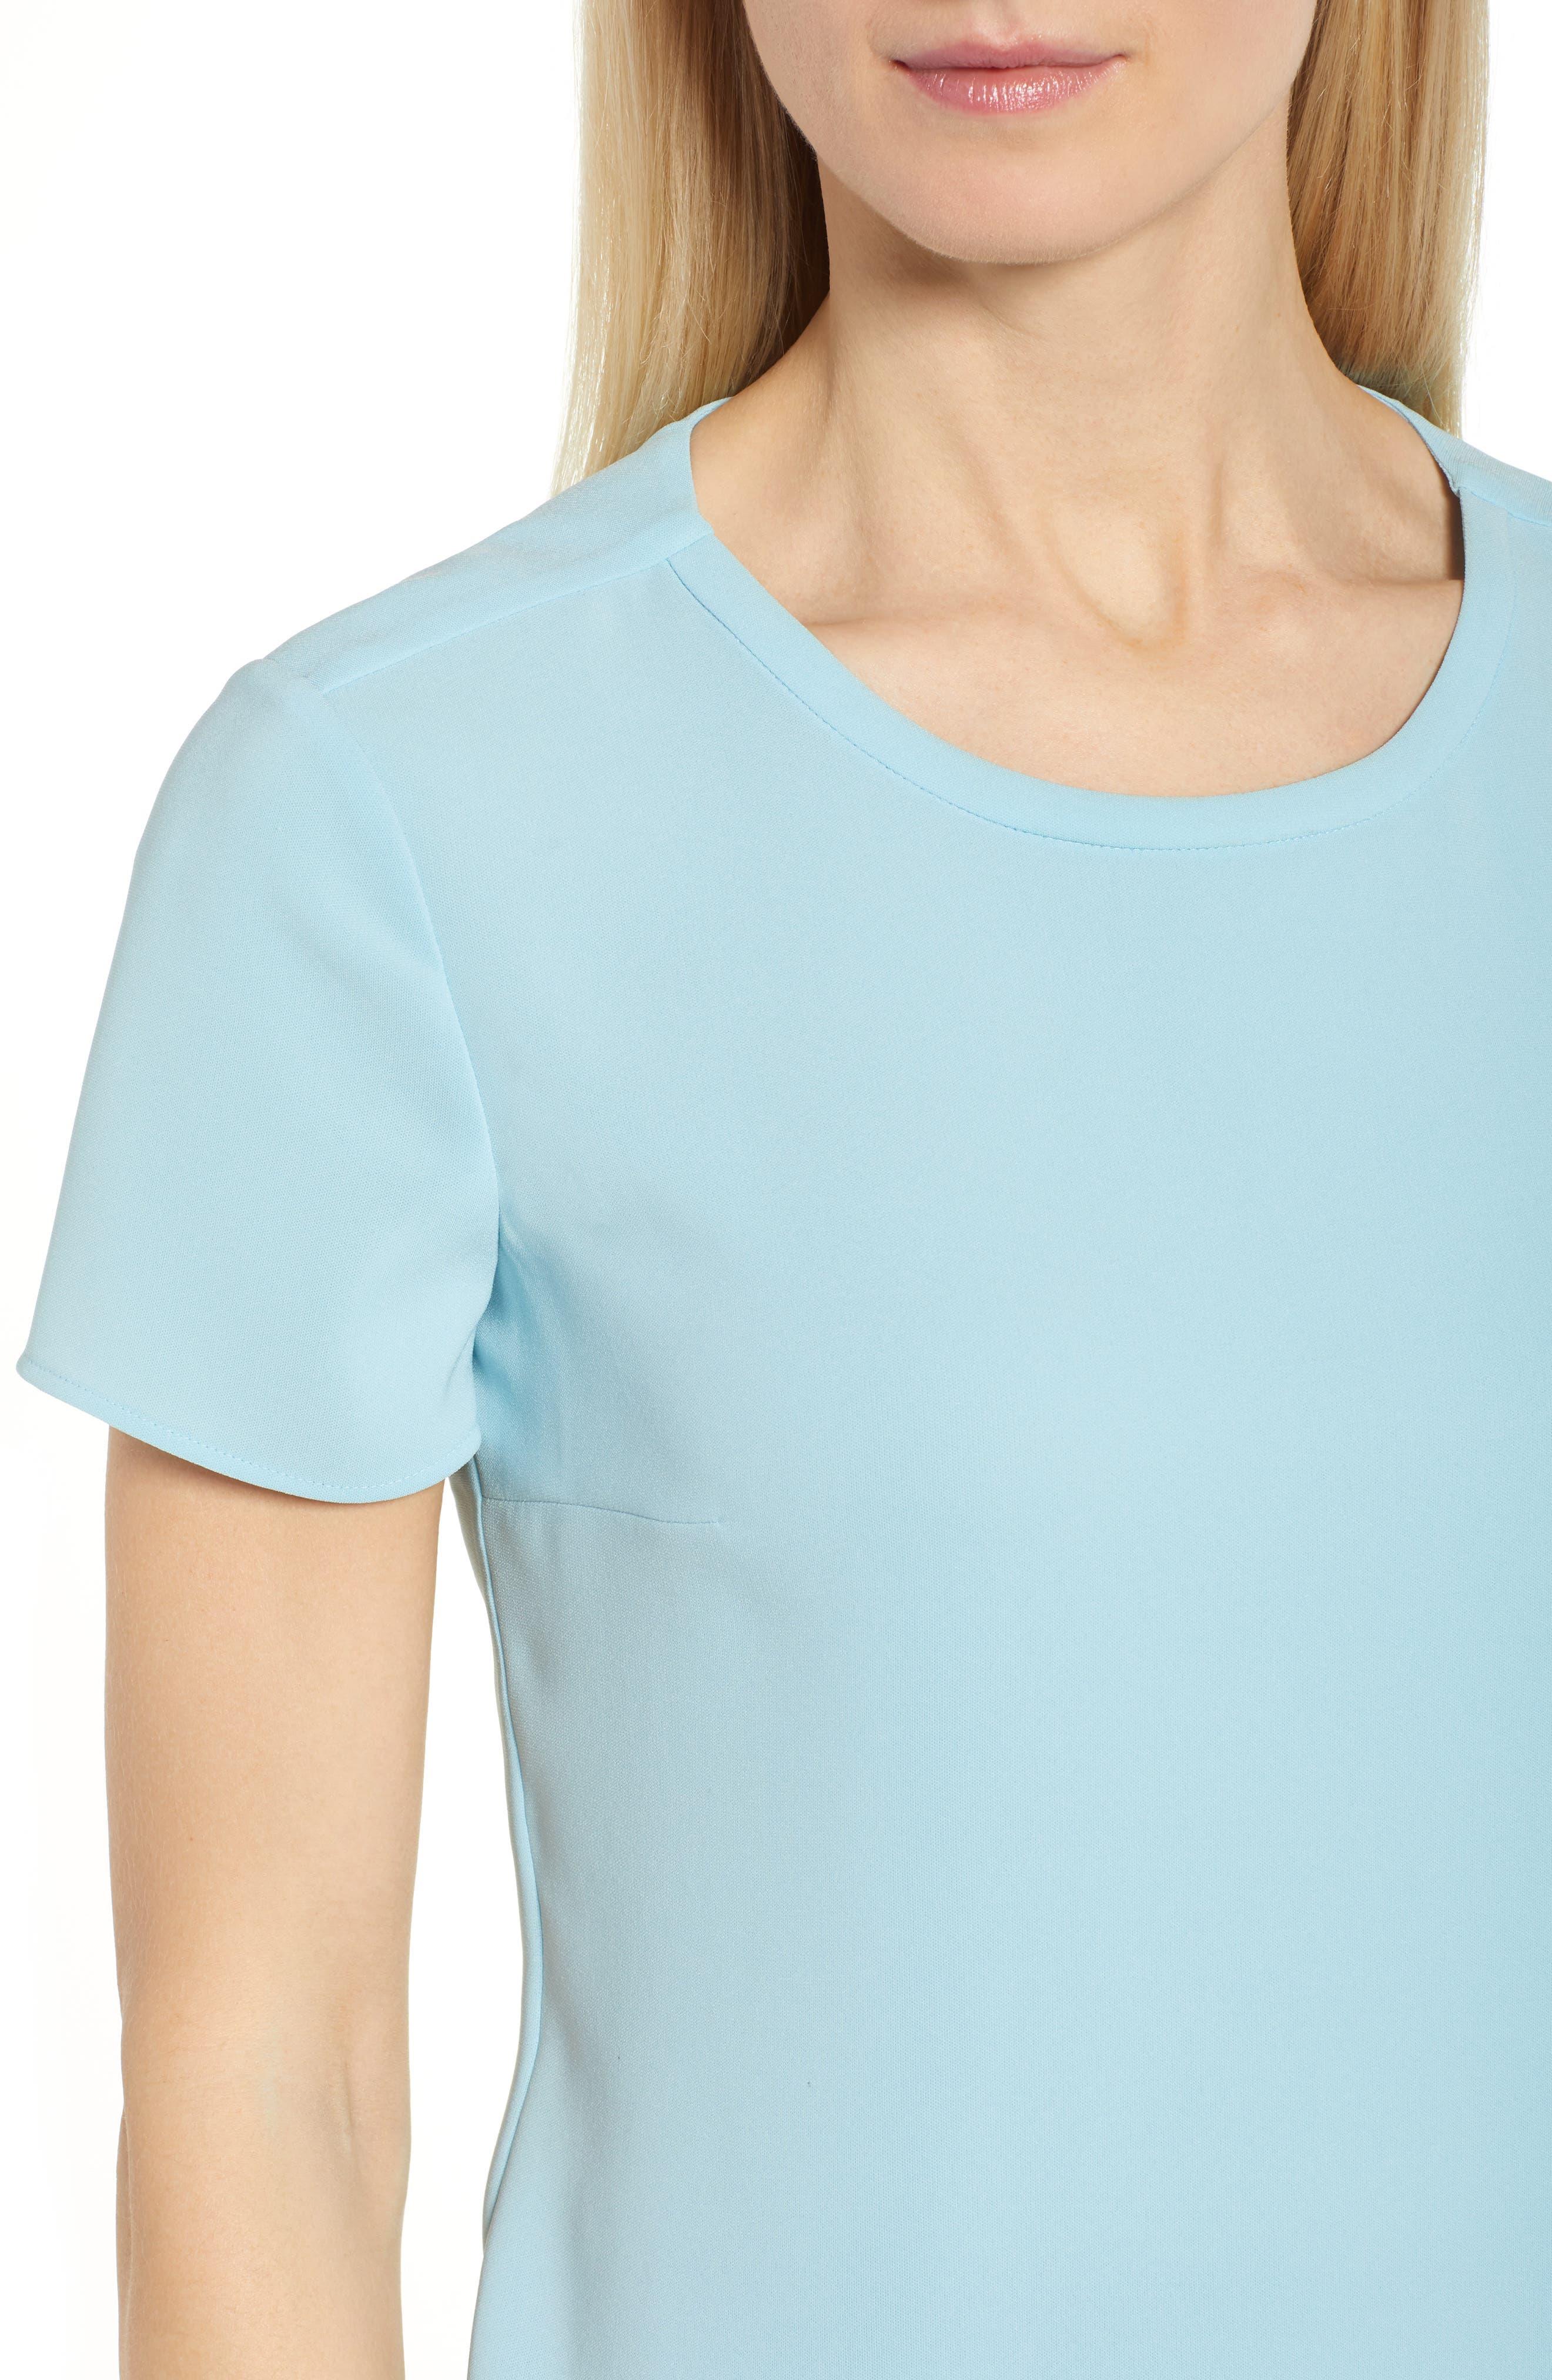 Ilyna Crepe Short Sleeve Top,                             Alternate thumbnail 4, color,                             Lagoon Blue